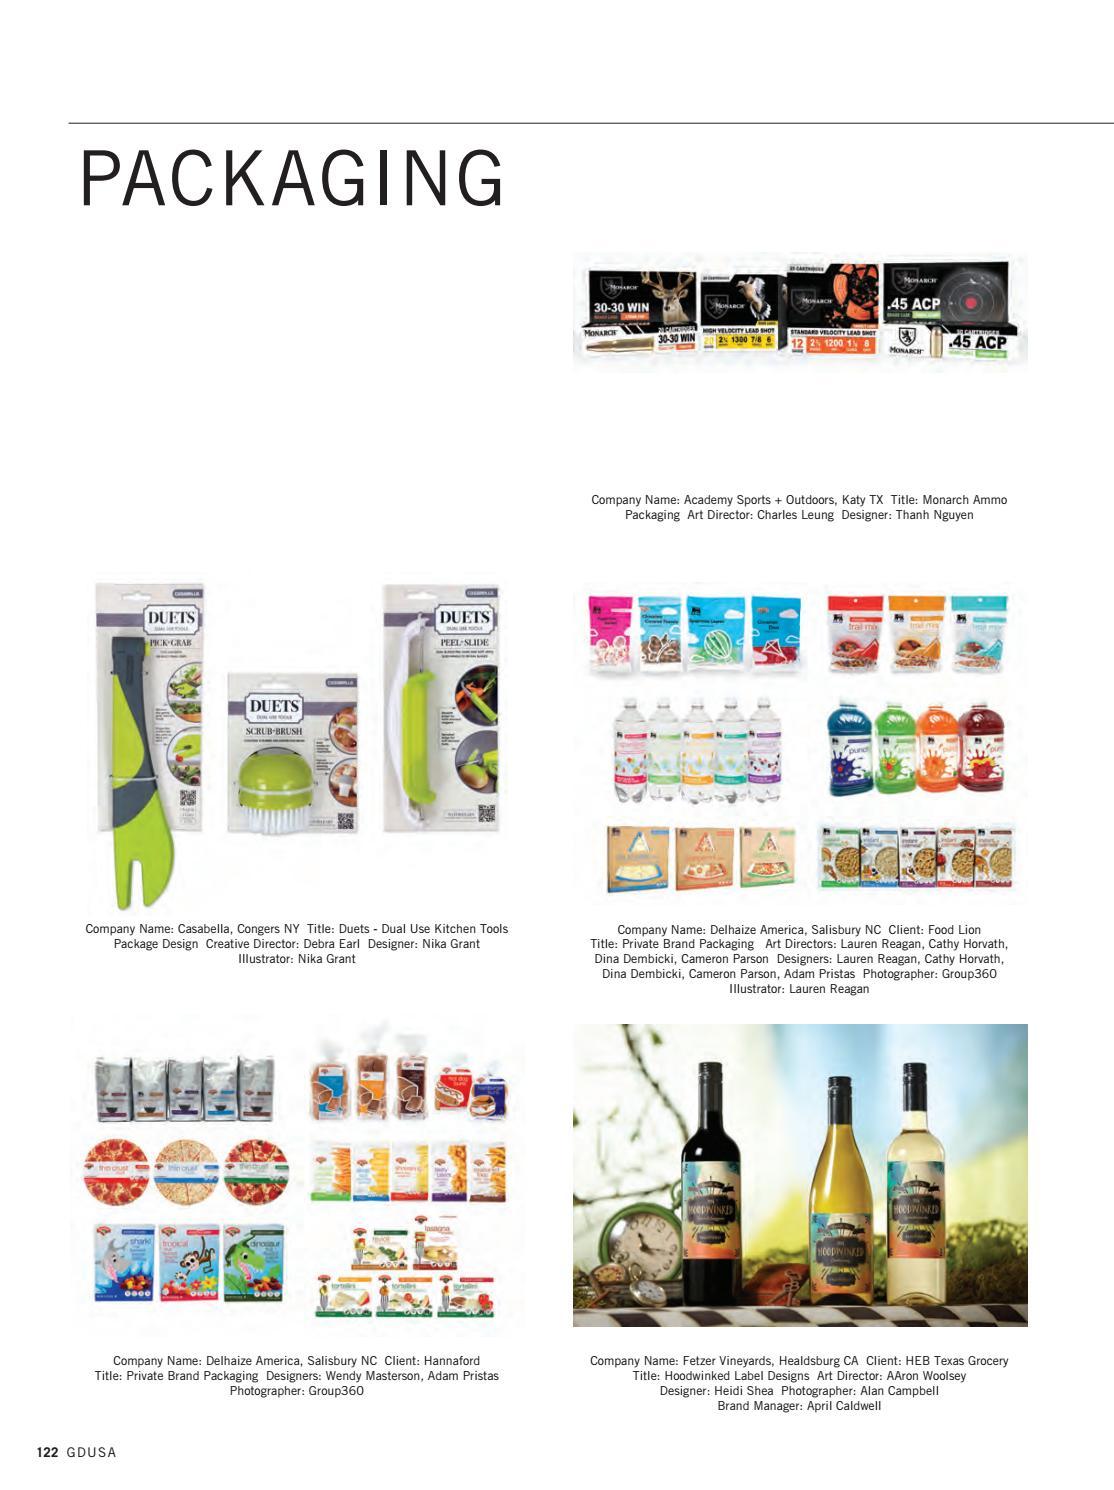 GDUSA August 2016 by Graphic Design USA - issuu